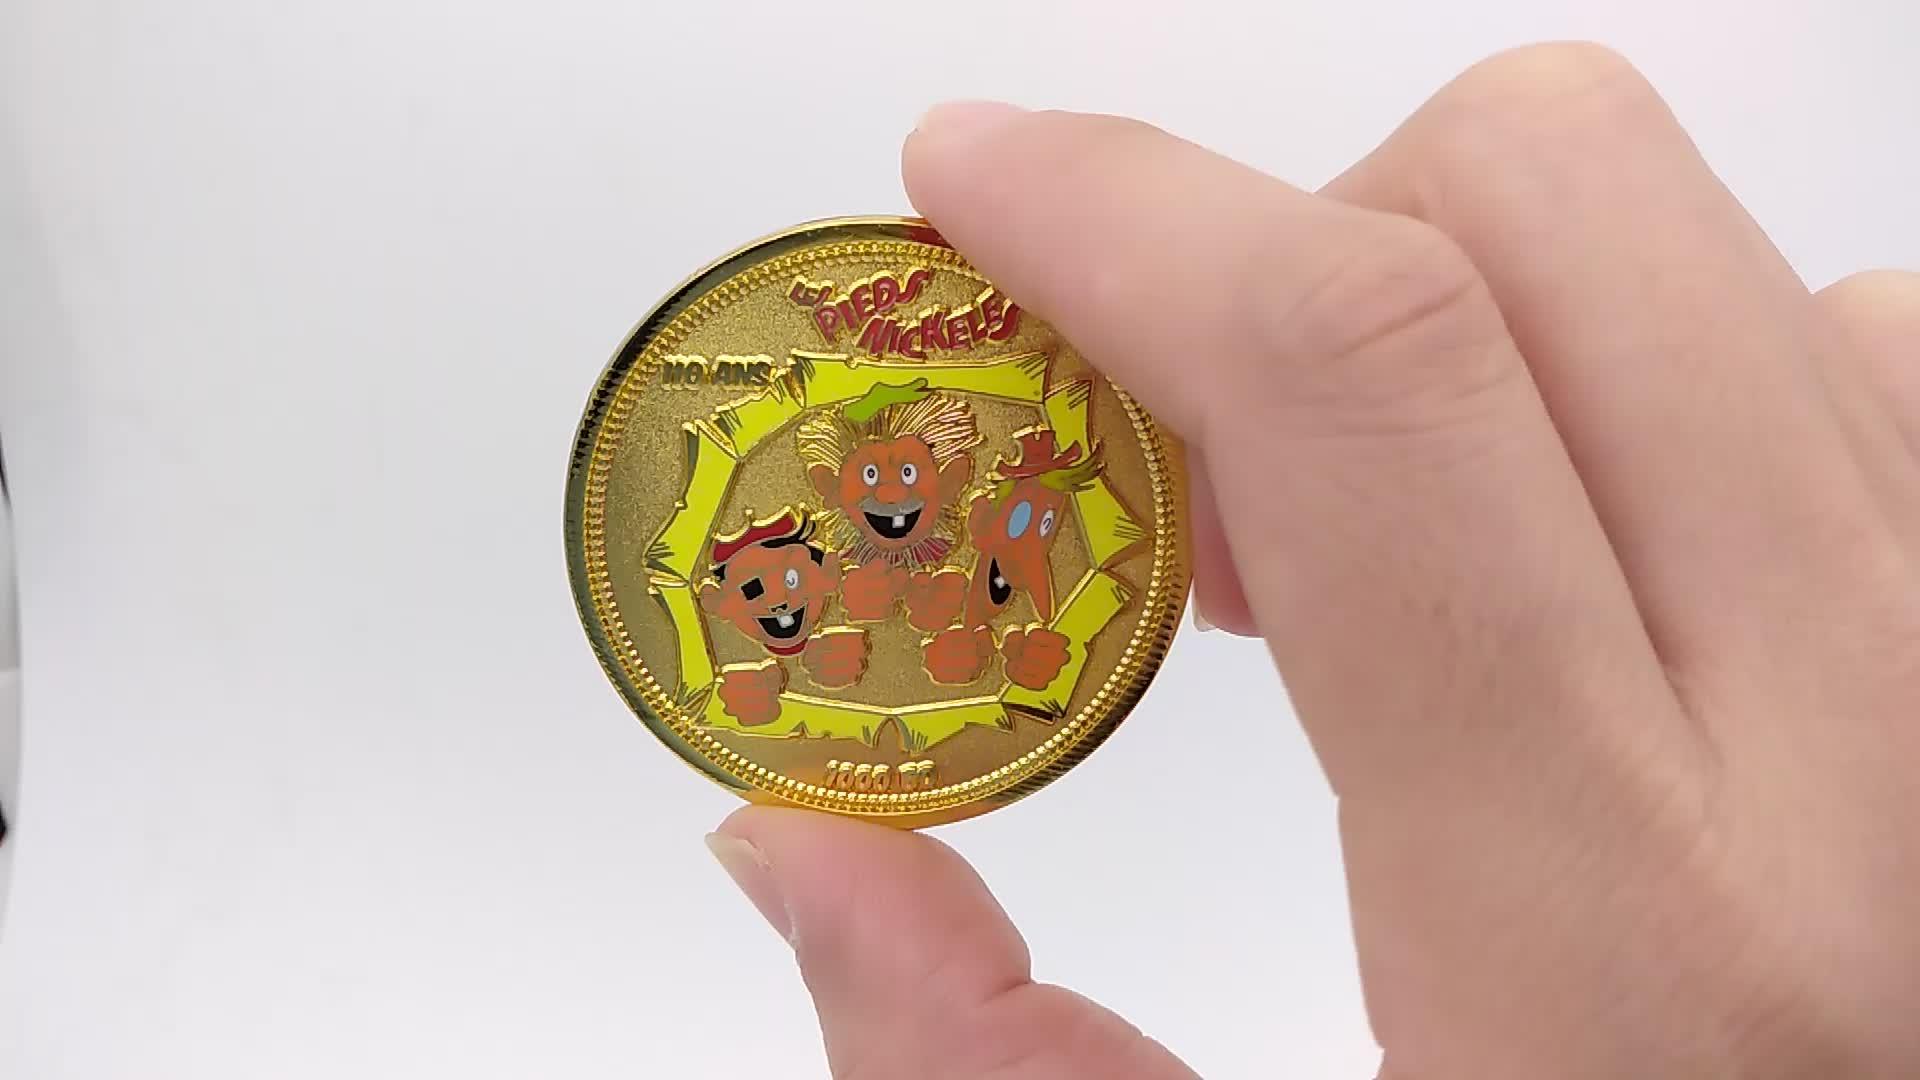 Custom metal hard enamel wedding challenge coin phoenix souvenir coin